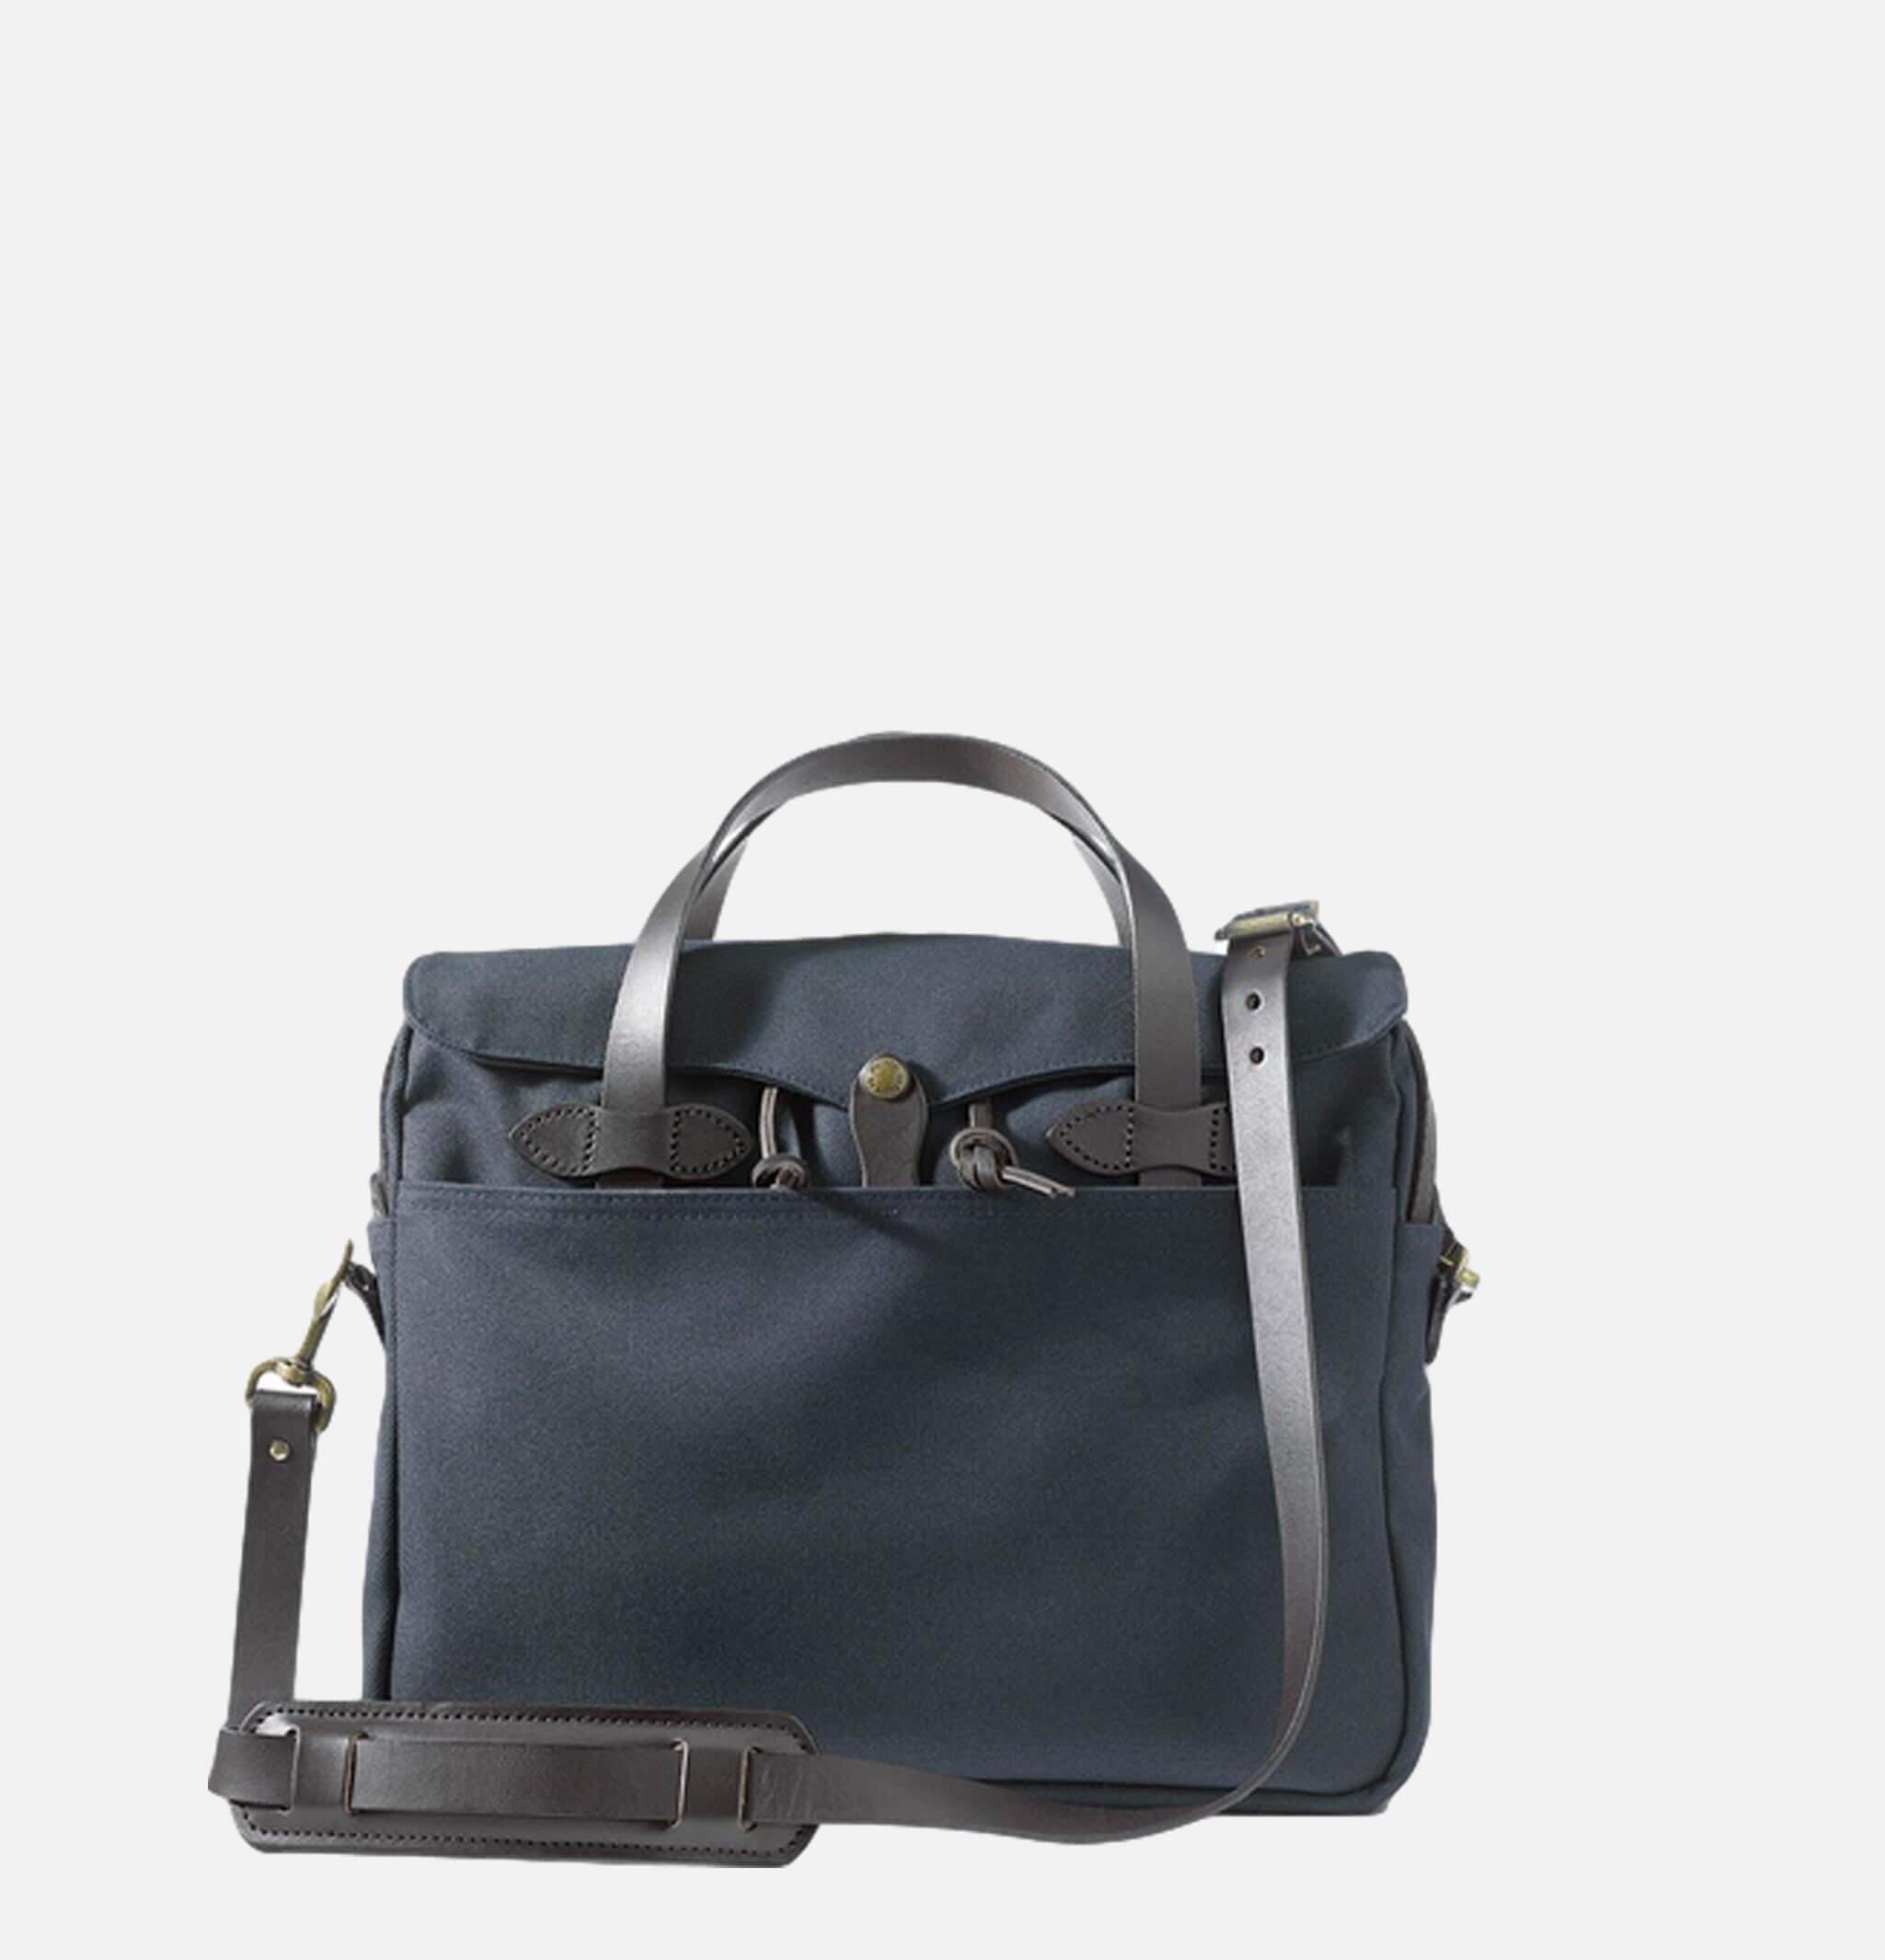 70256 - Original Briefcase...